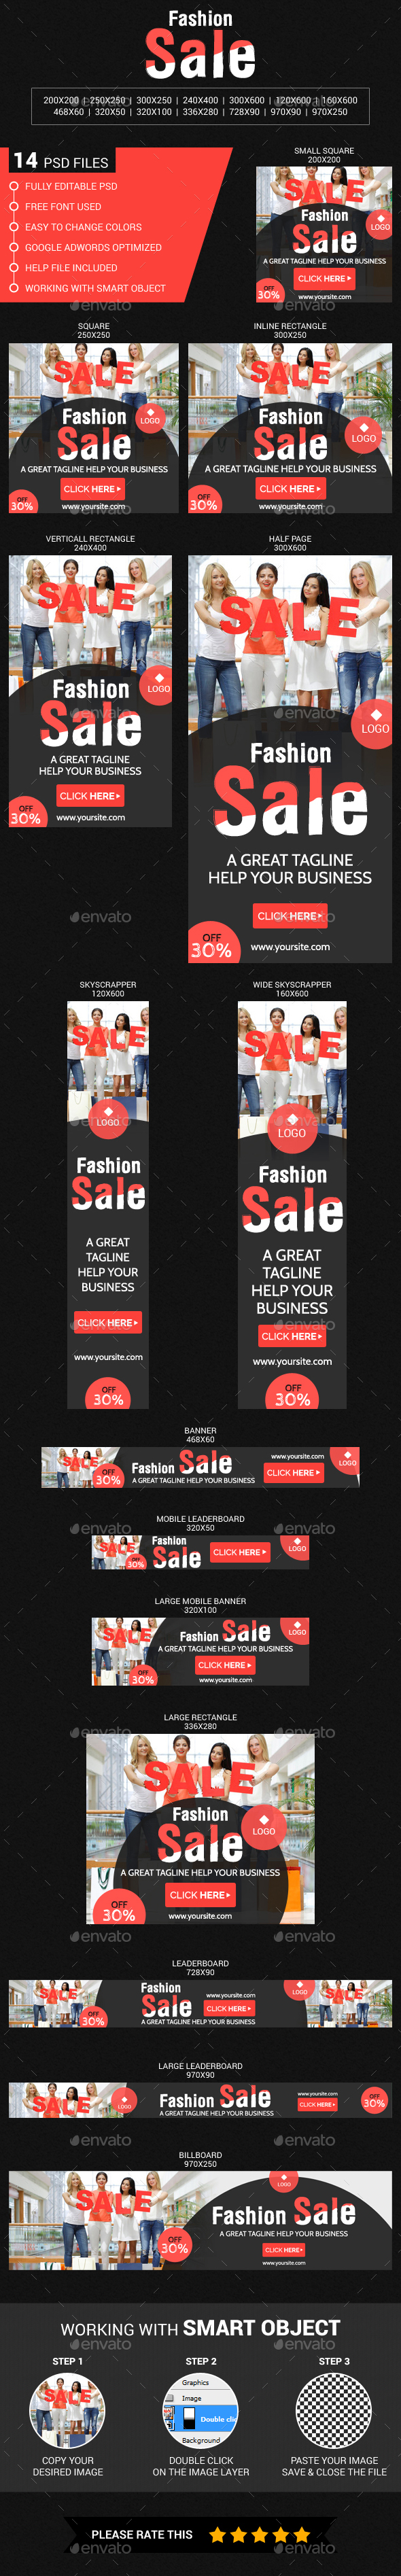 Fashion Sale - Banners & Ads Web Elements